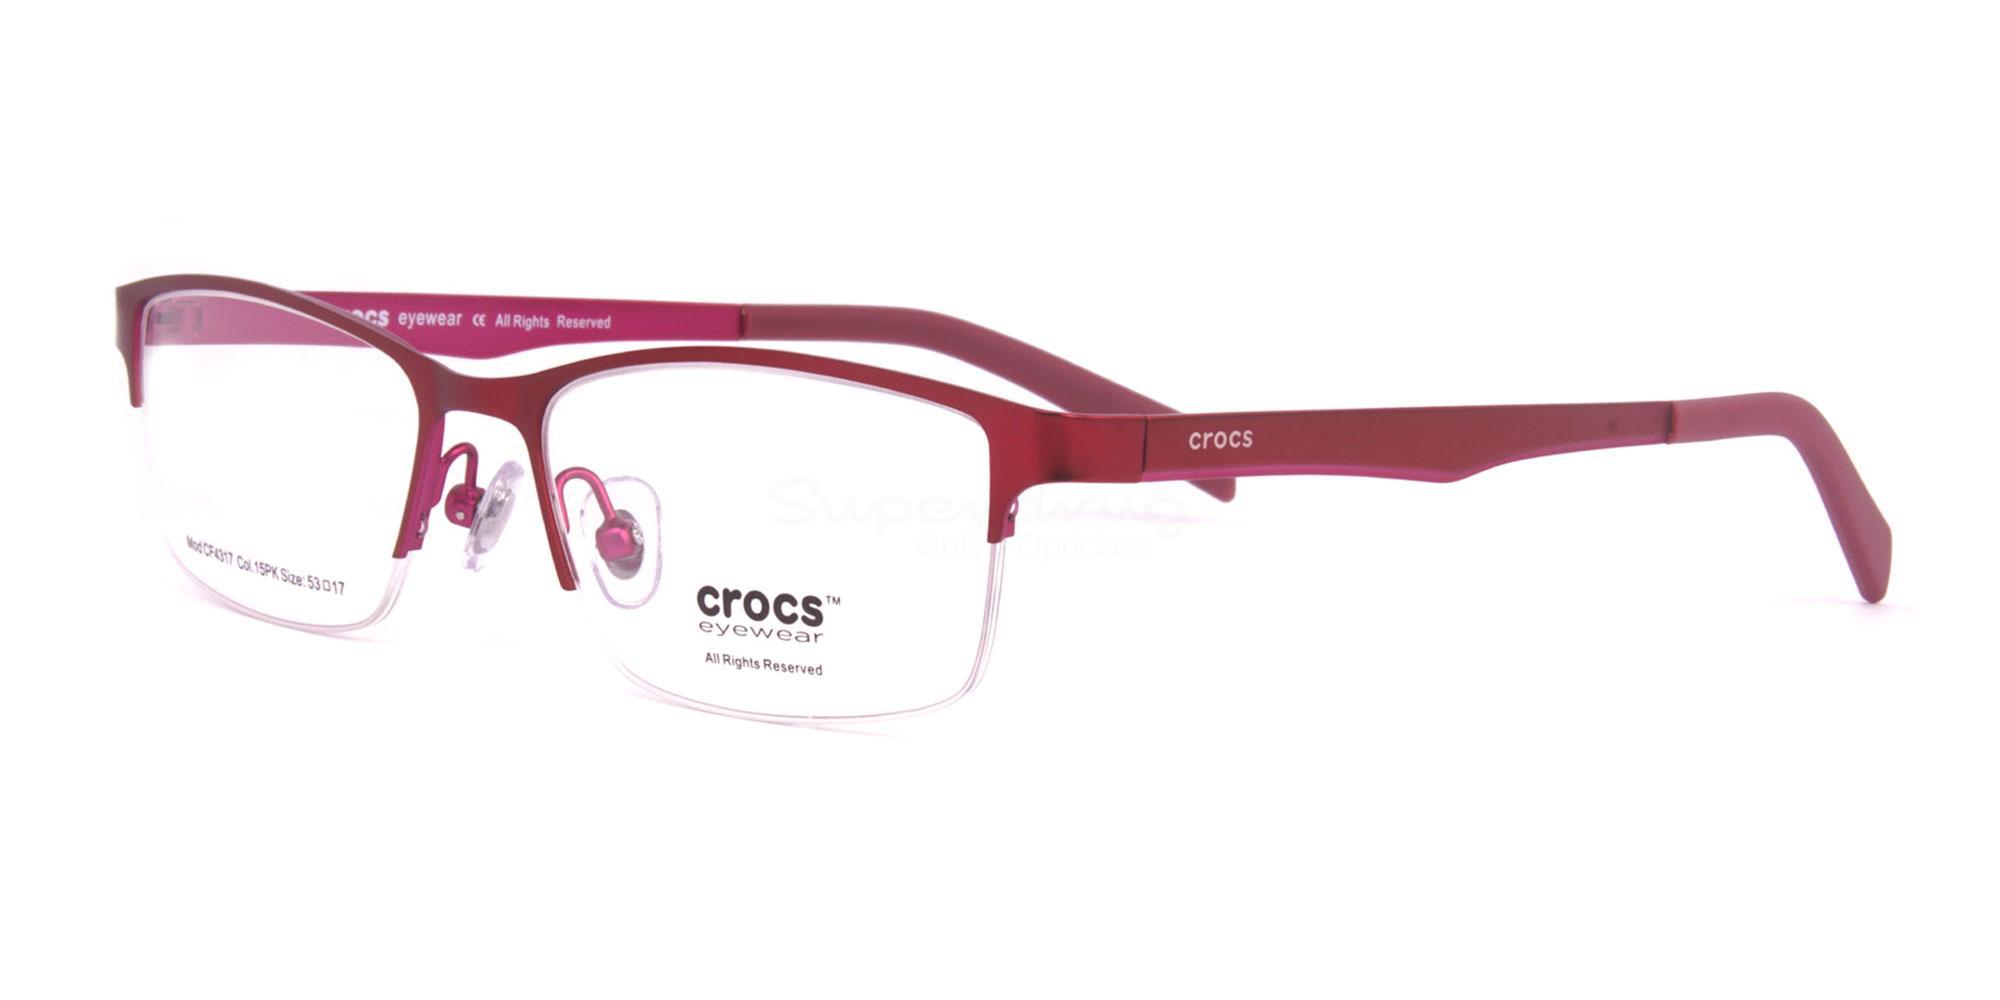 15PK CF4317 Glasses, Crocs Eyewear